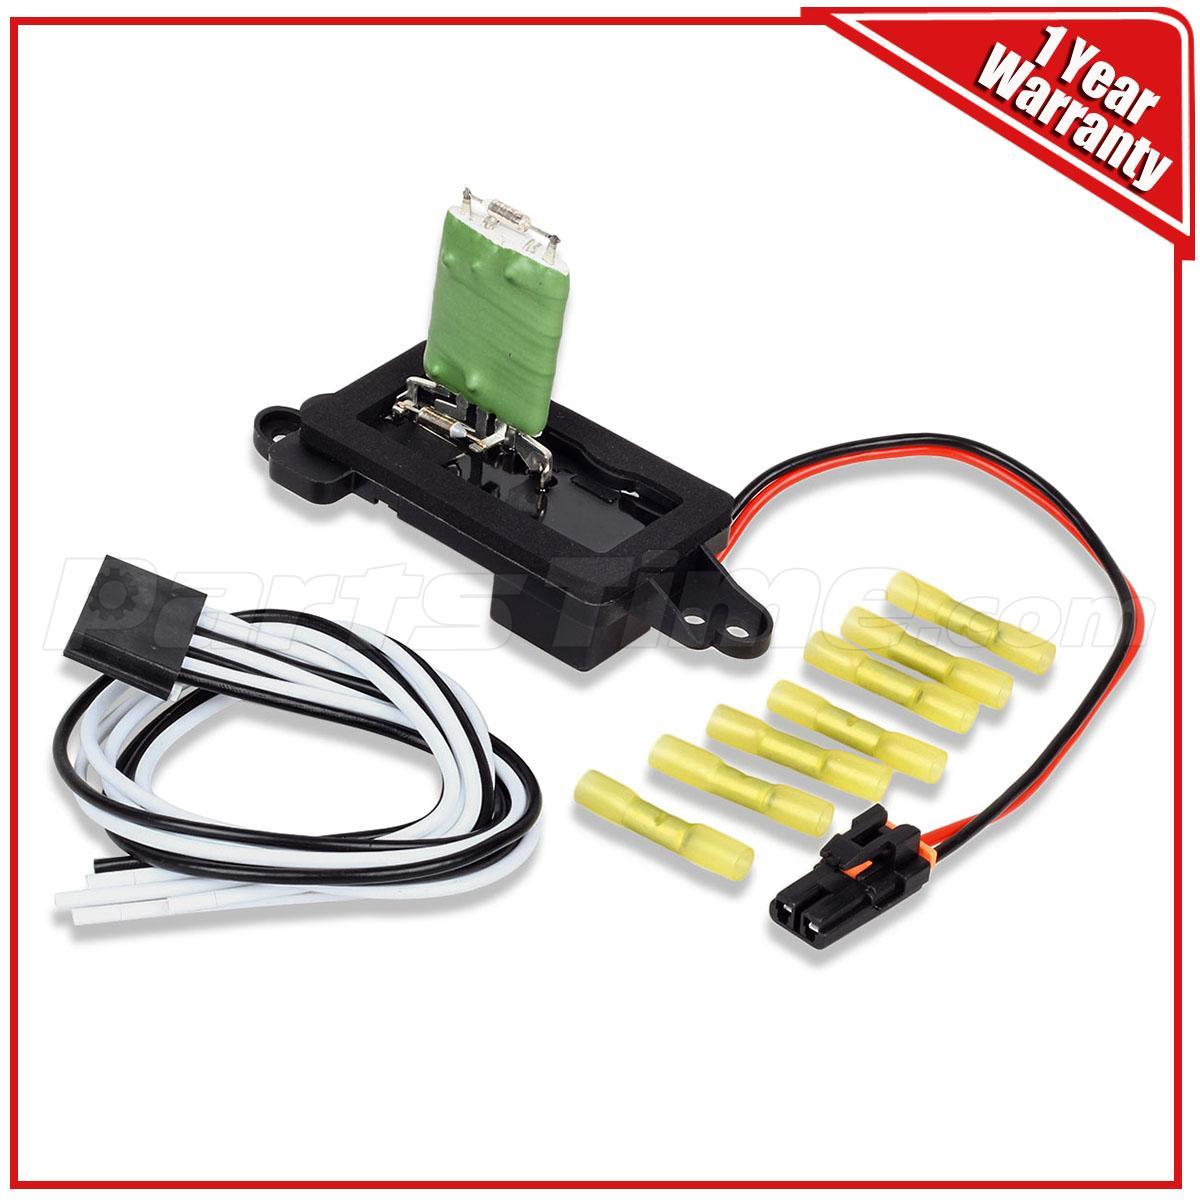 cbt1c110 blower motor wiring harness cbt1c110 instructions harness blower wiring motor cbt1c110 harness on cbt1c110 blower motor wiring harness